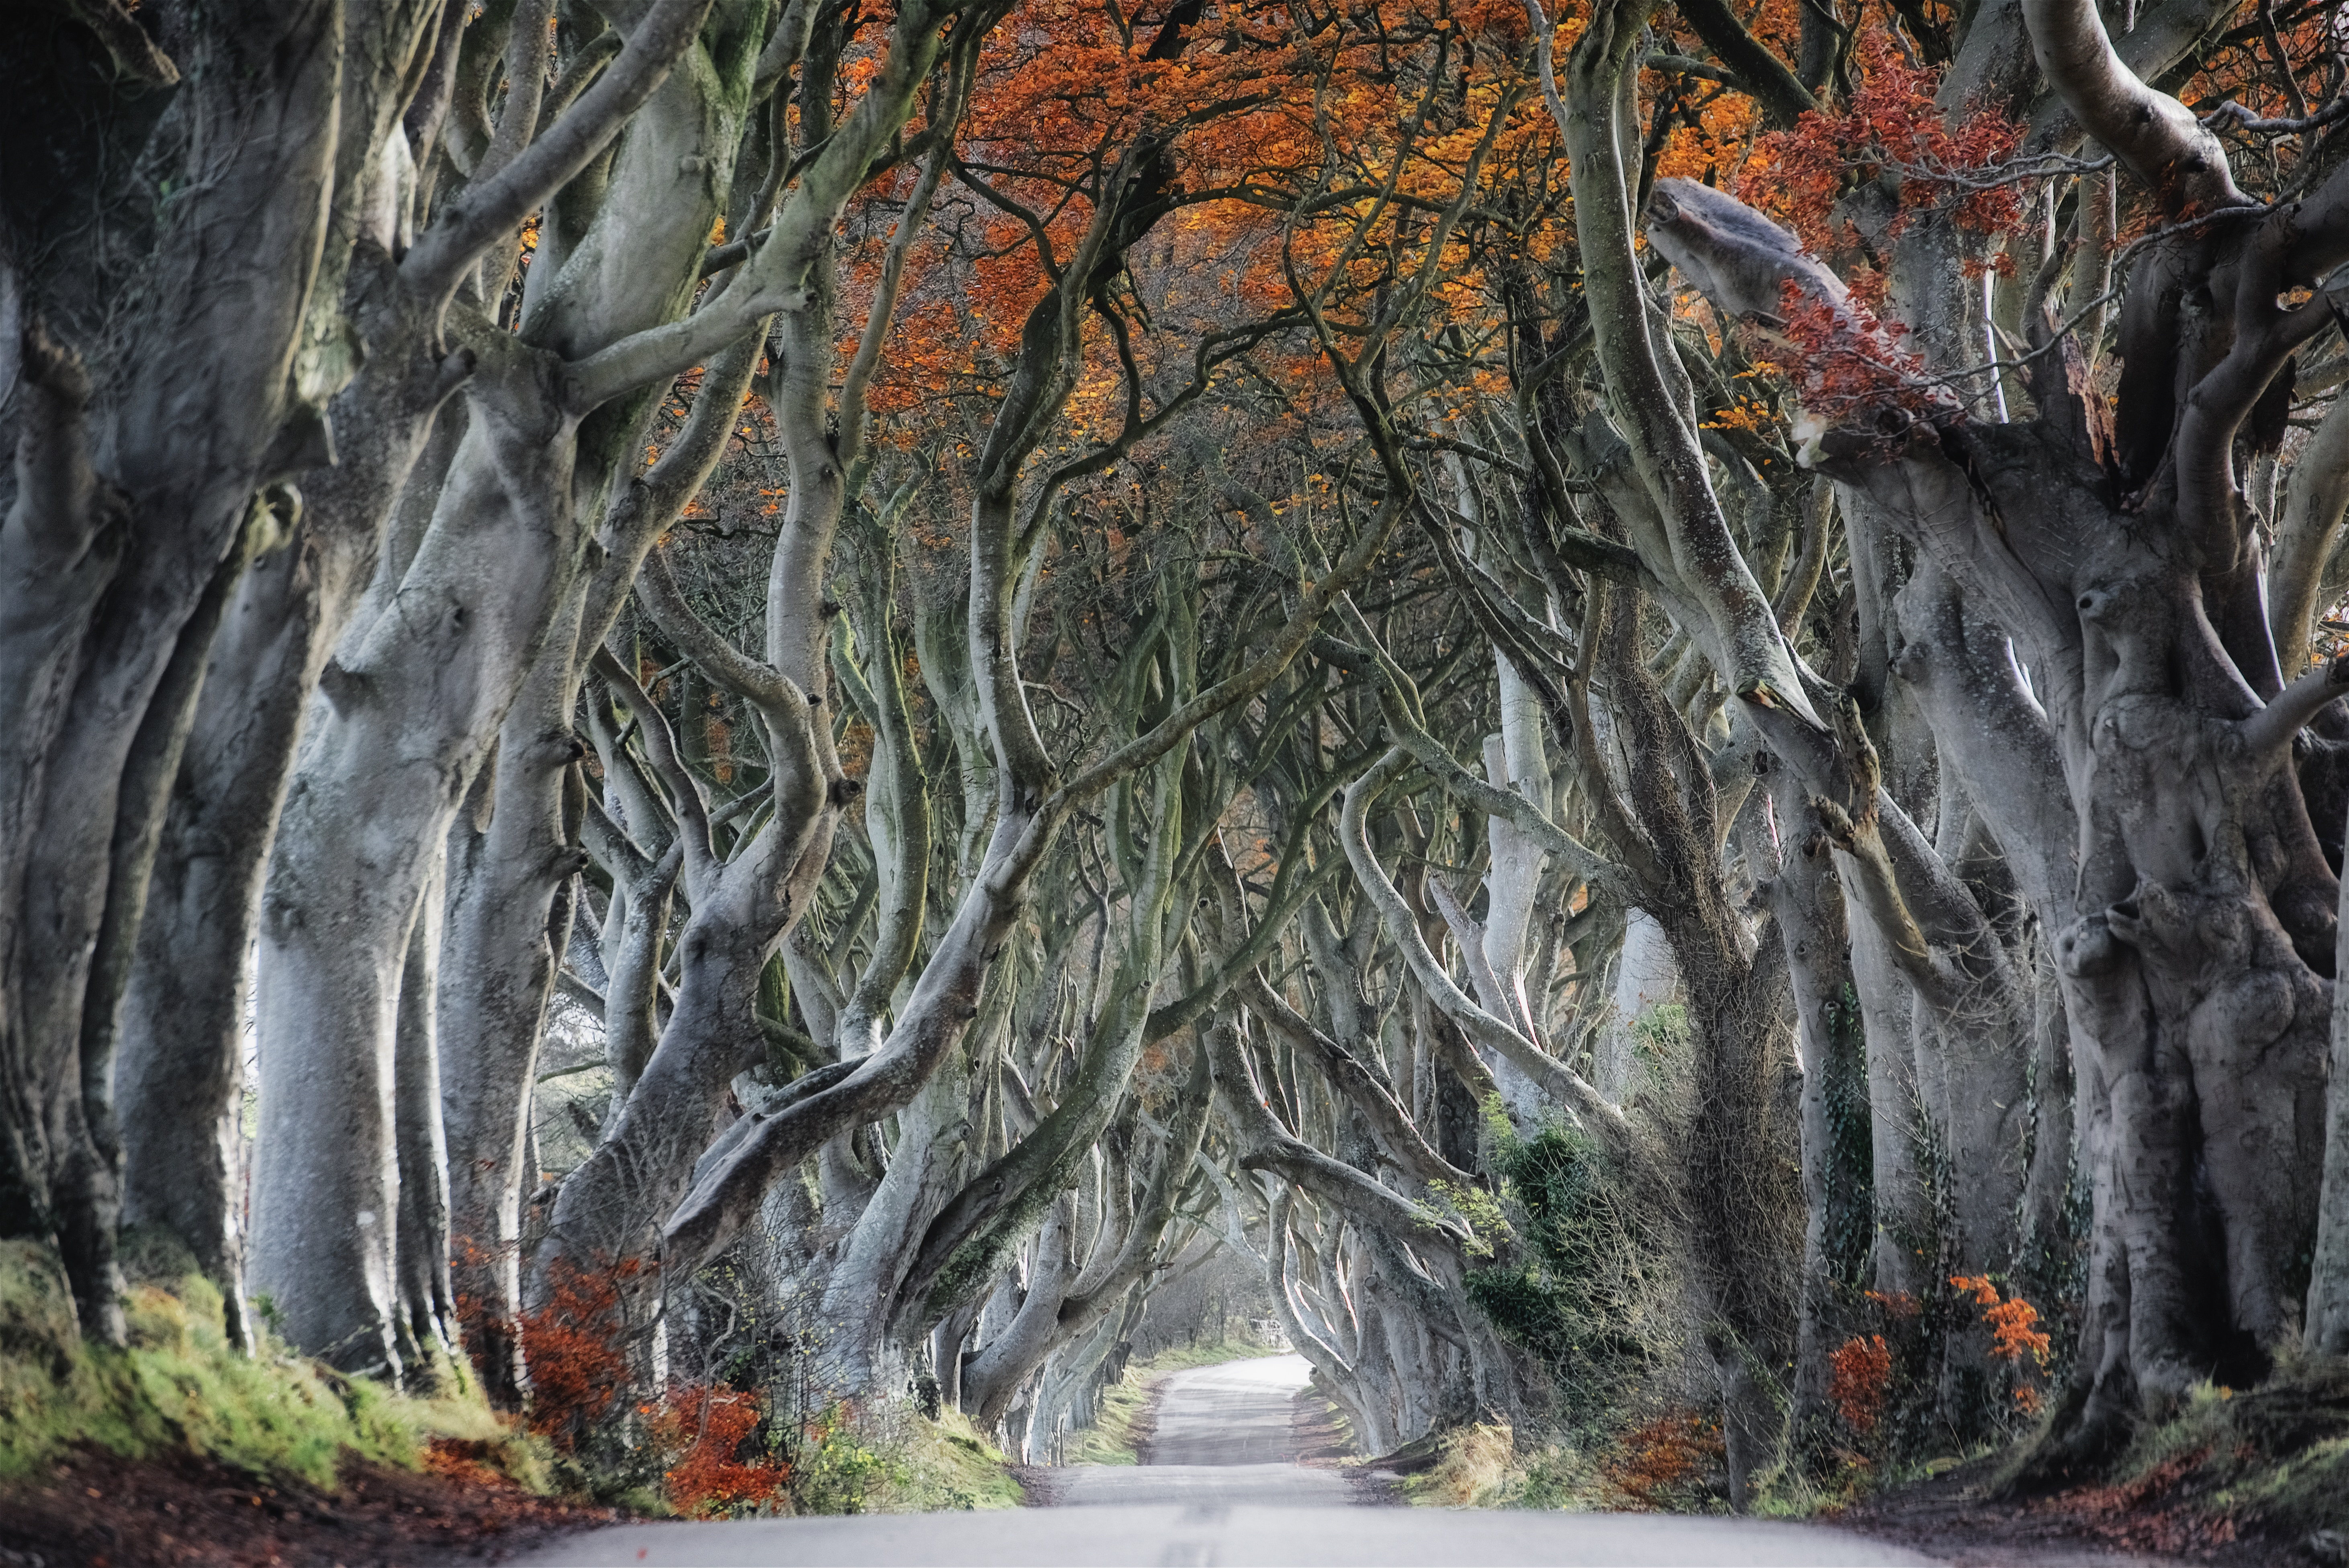 The Dark Hedges of Northern Ireland's County Antrim